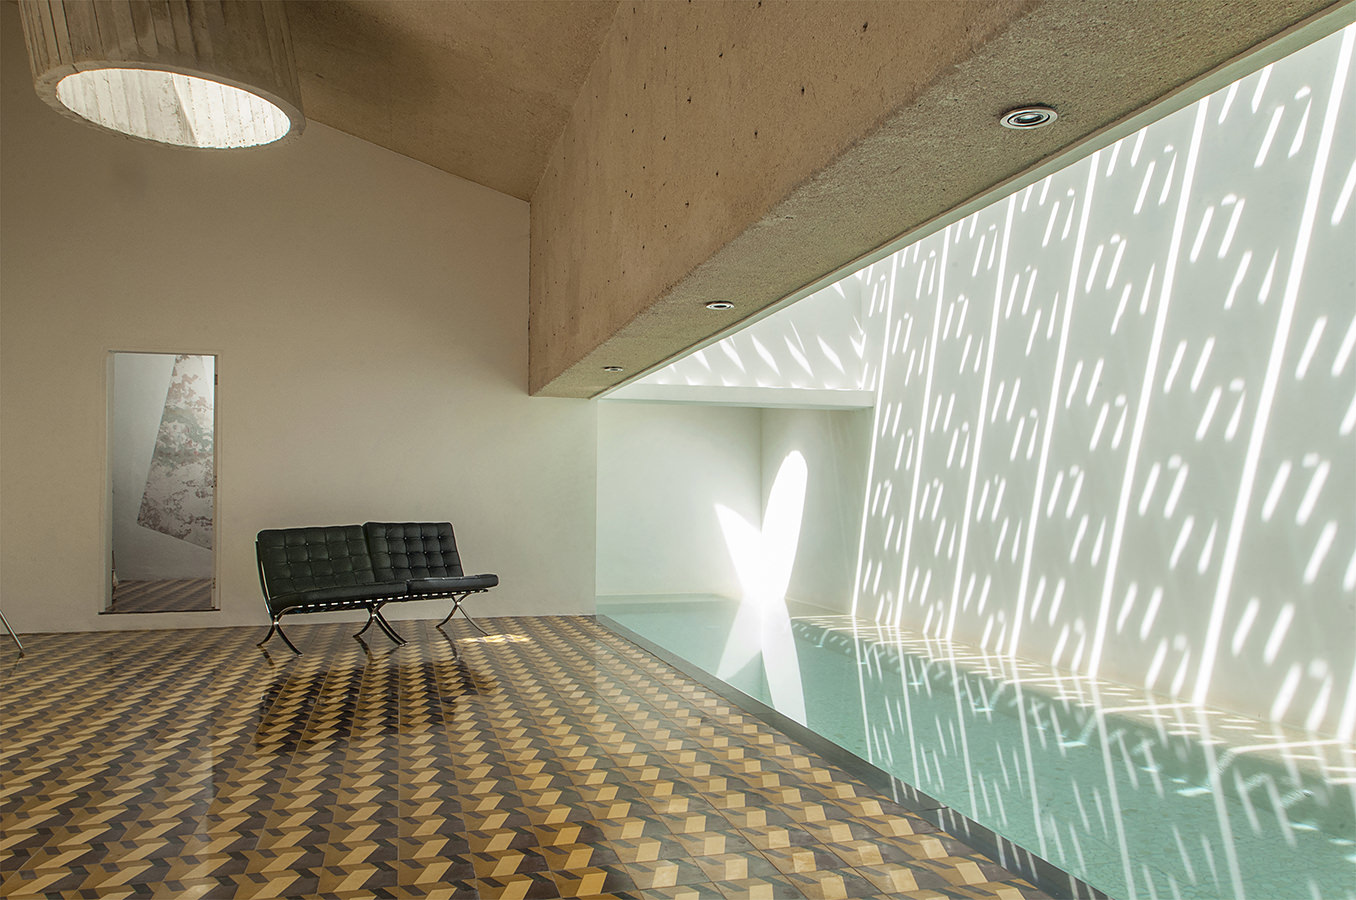 Casa_Delpin_Interior_pool_hydraulic_concrete_ tile_Miramar_Puerto_Rico-1.jpg